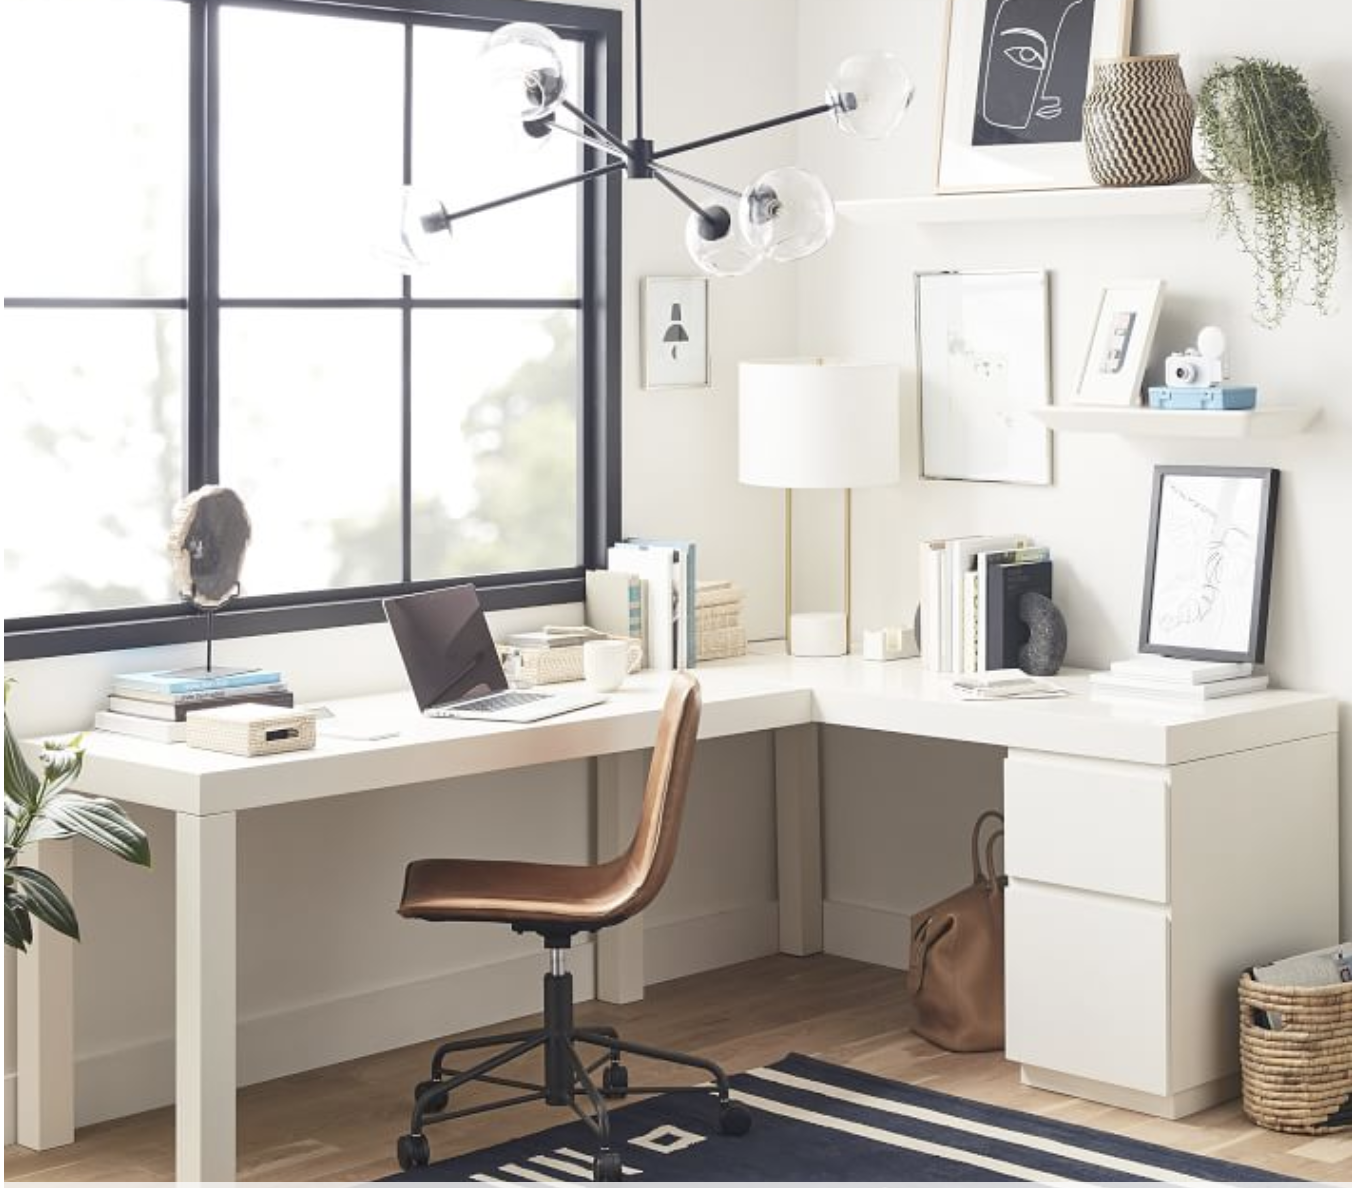 Parsons L Shaped Desk File Cabinet Set In 2020 Parsons Desk L